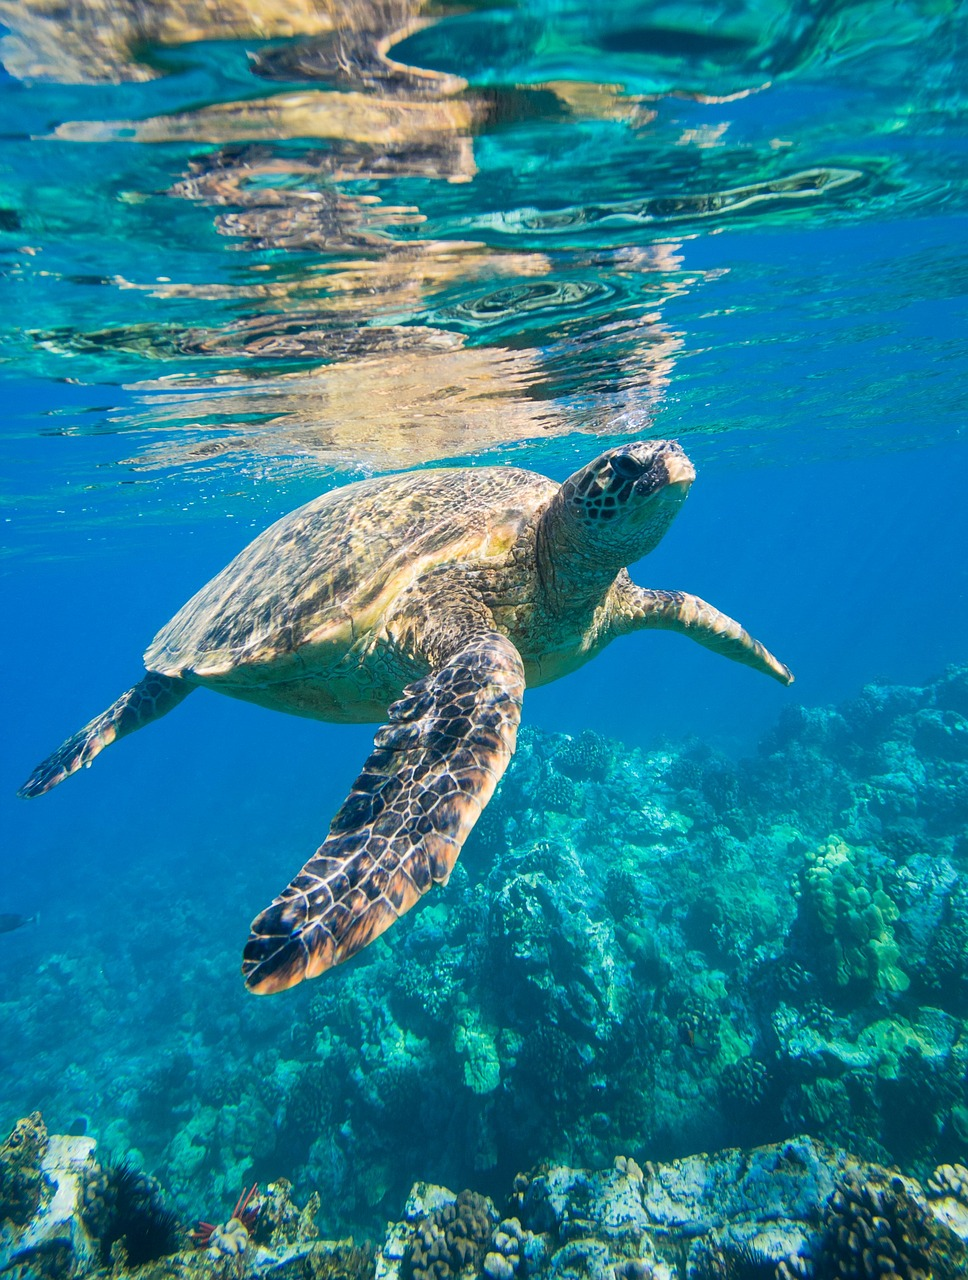 Tortuga marina nada en las profundidades del mar